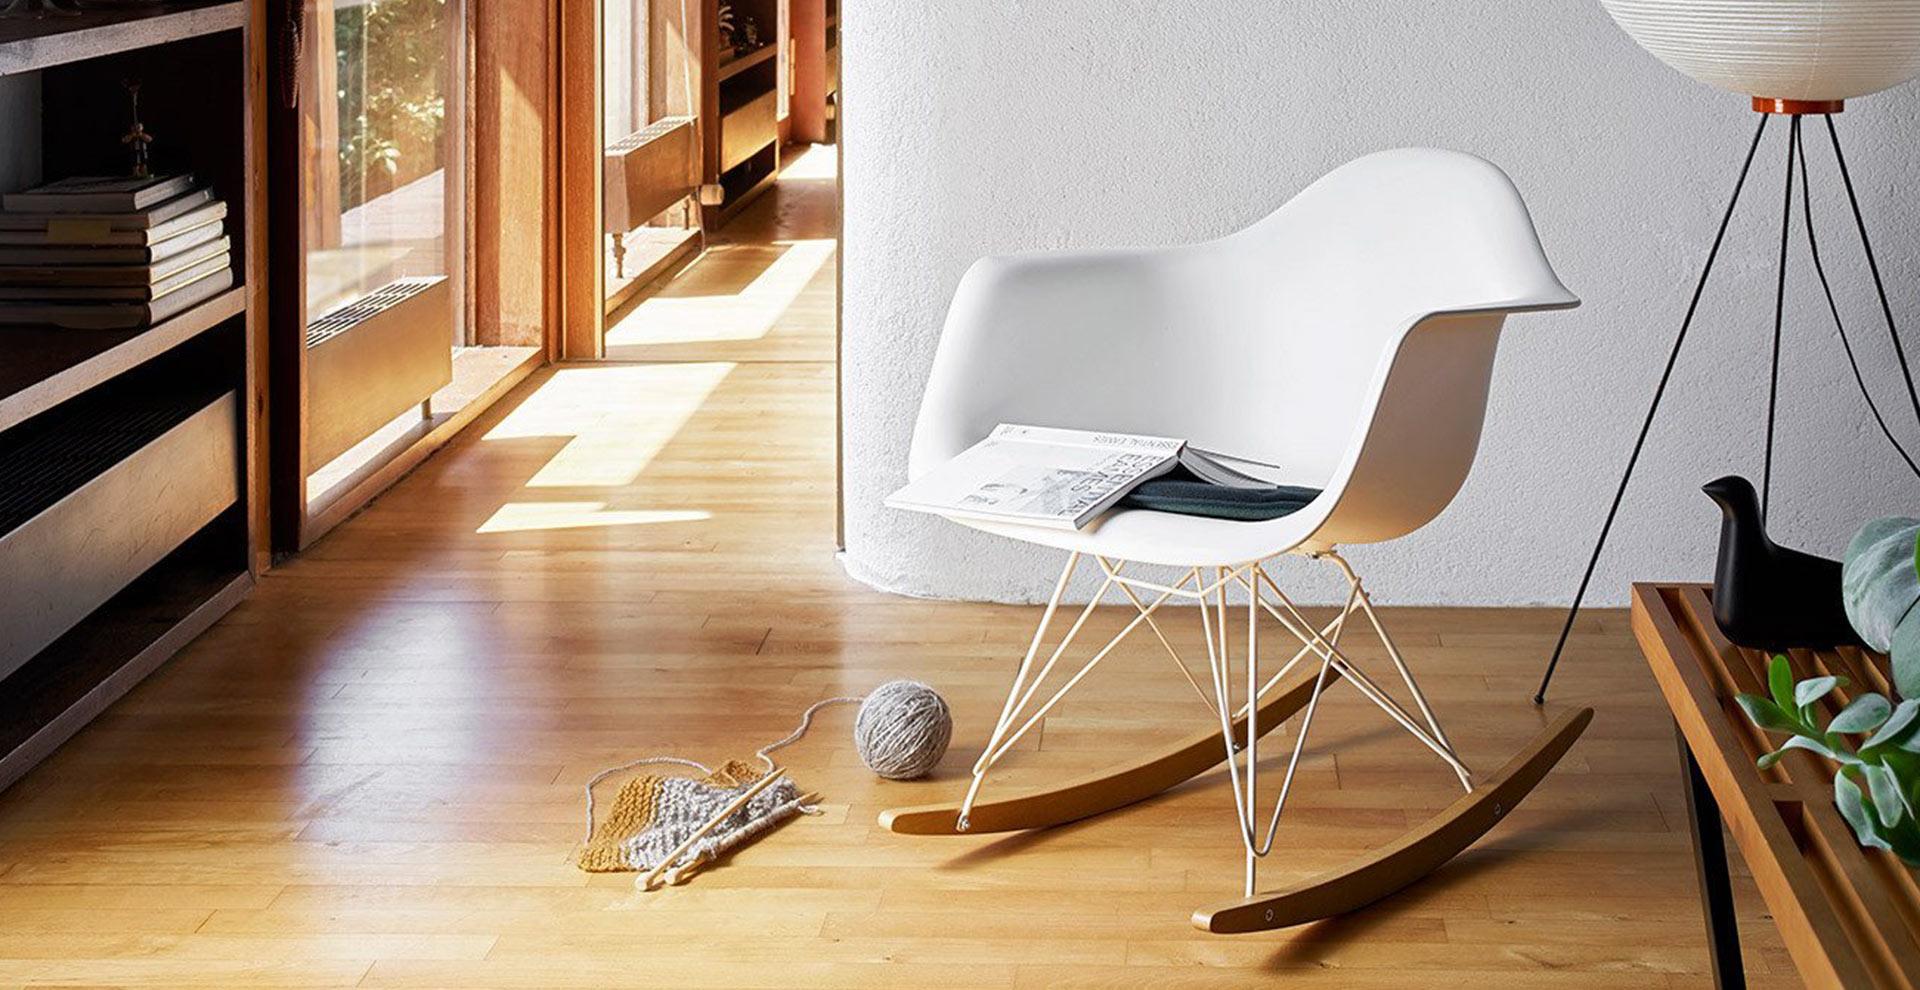 Vitra Sedia A Dondolo Eames Plastic Armchair Rar : Eames plastic armchair rar vitra poltroncina eames plastic